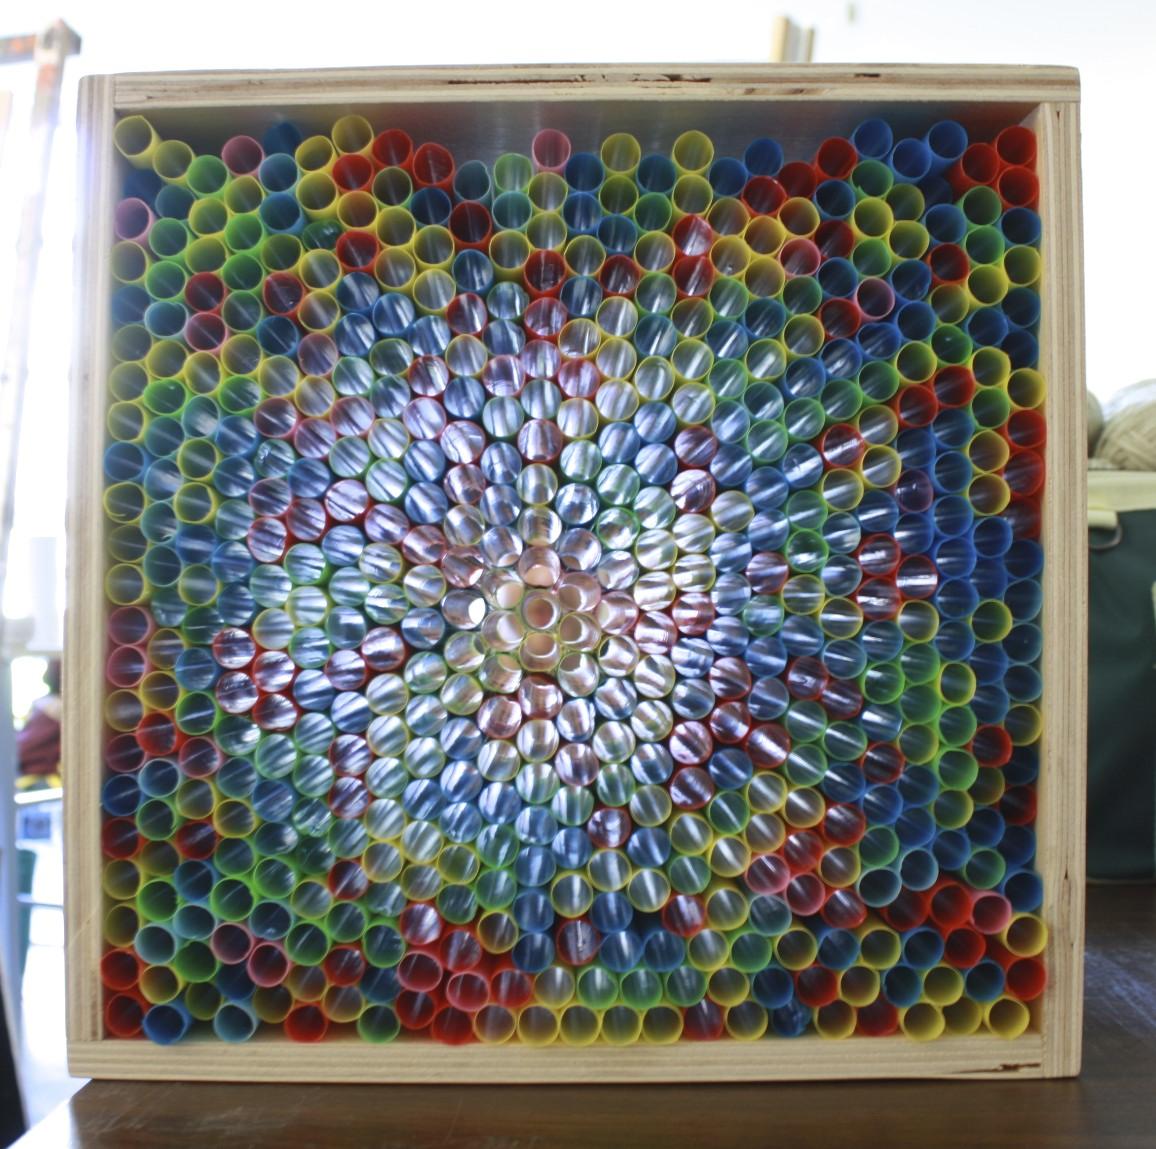 Nic Vandergugten, Straw Light Box Experiment, Feb 2015